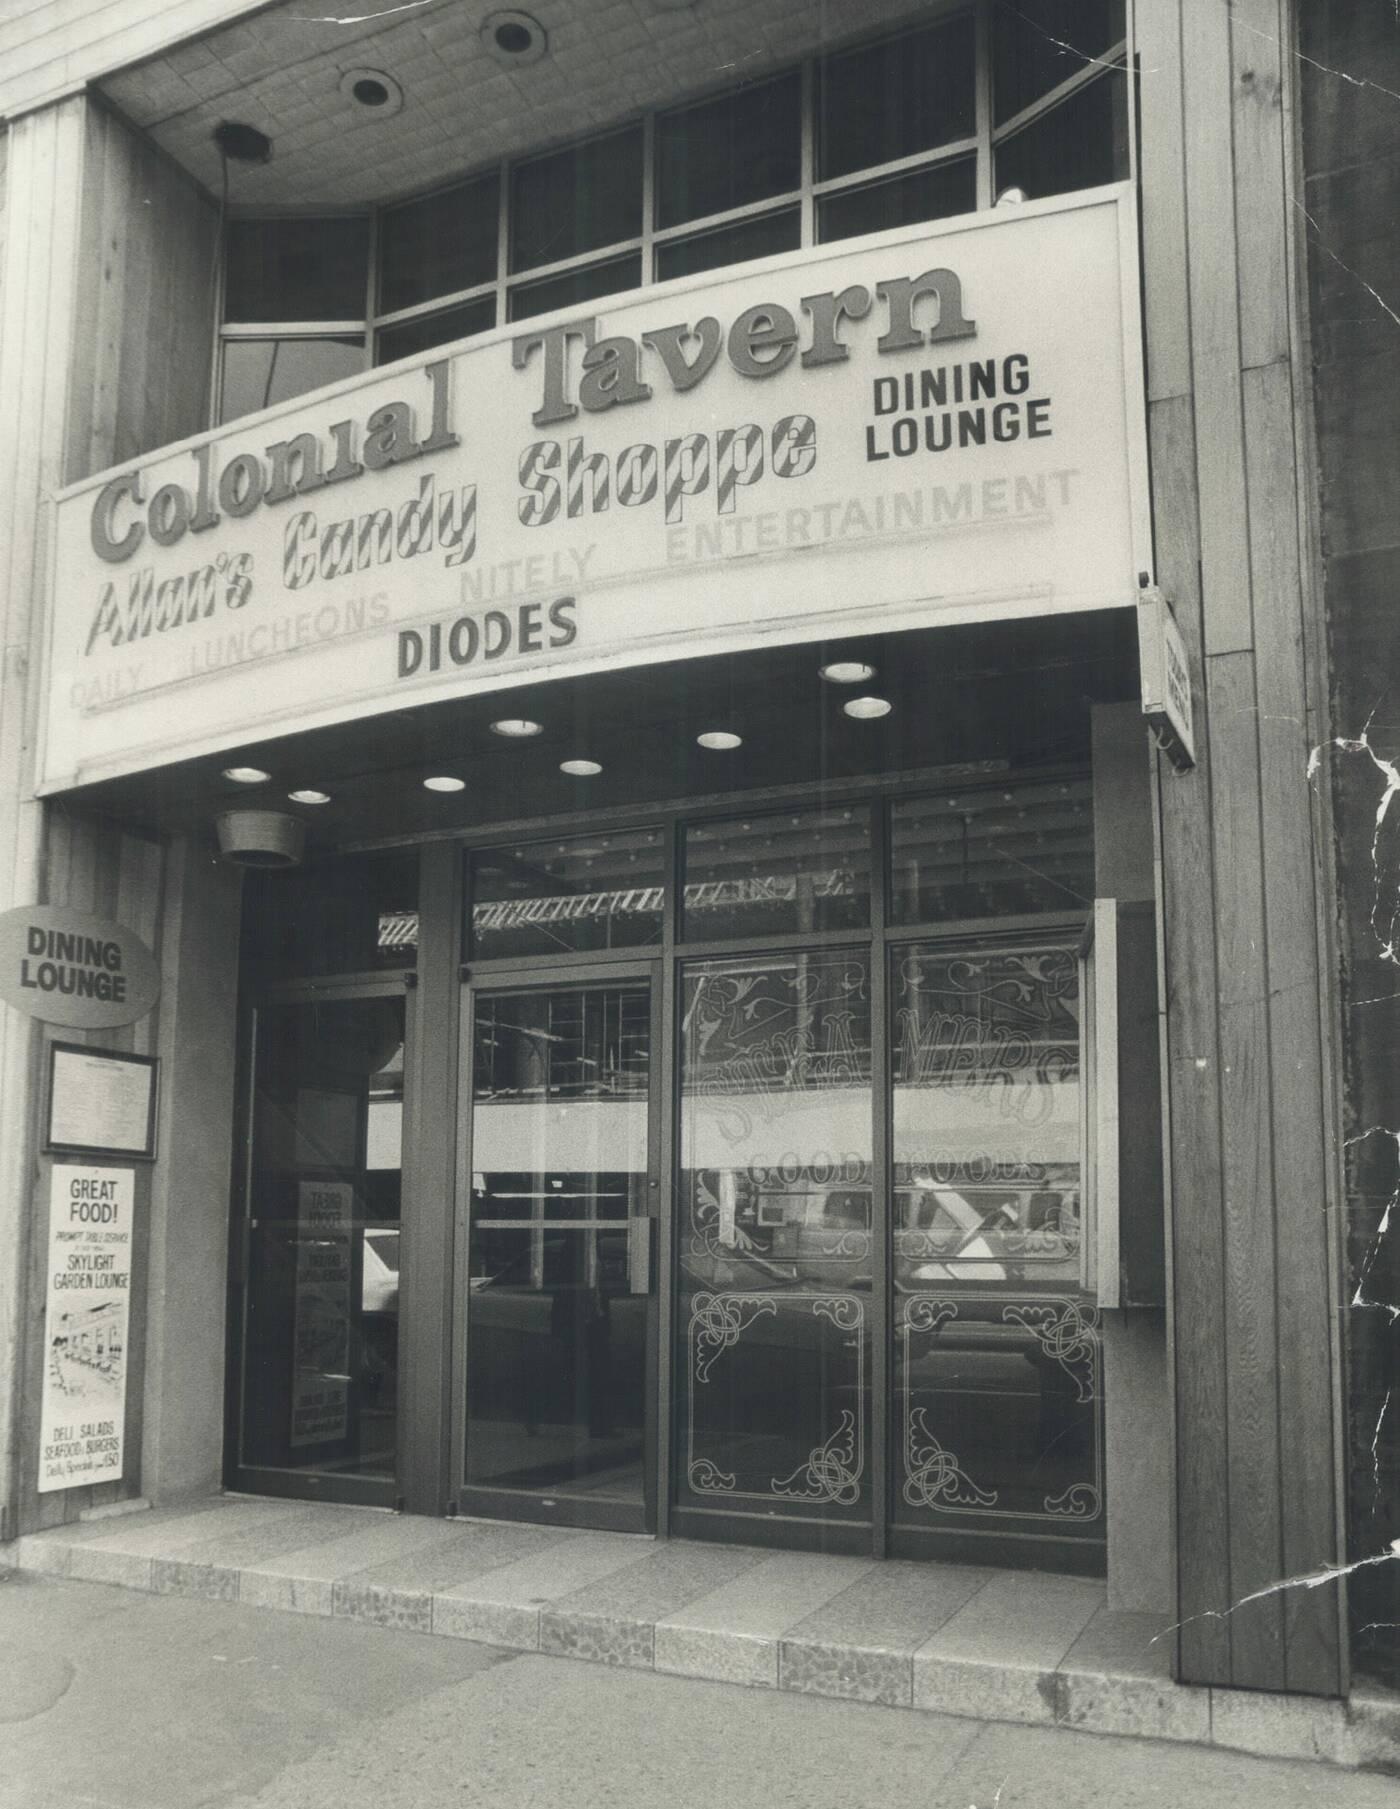 colonial tavern toronto